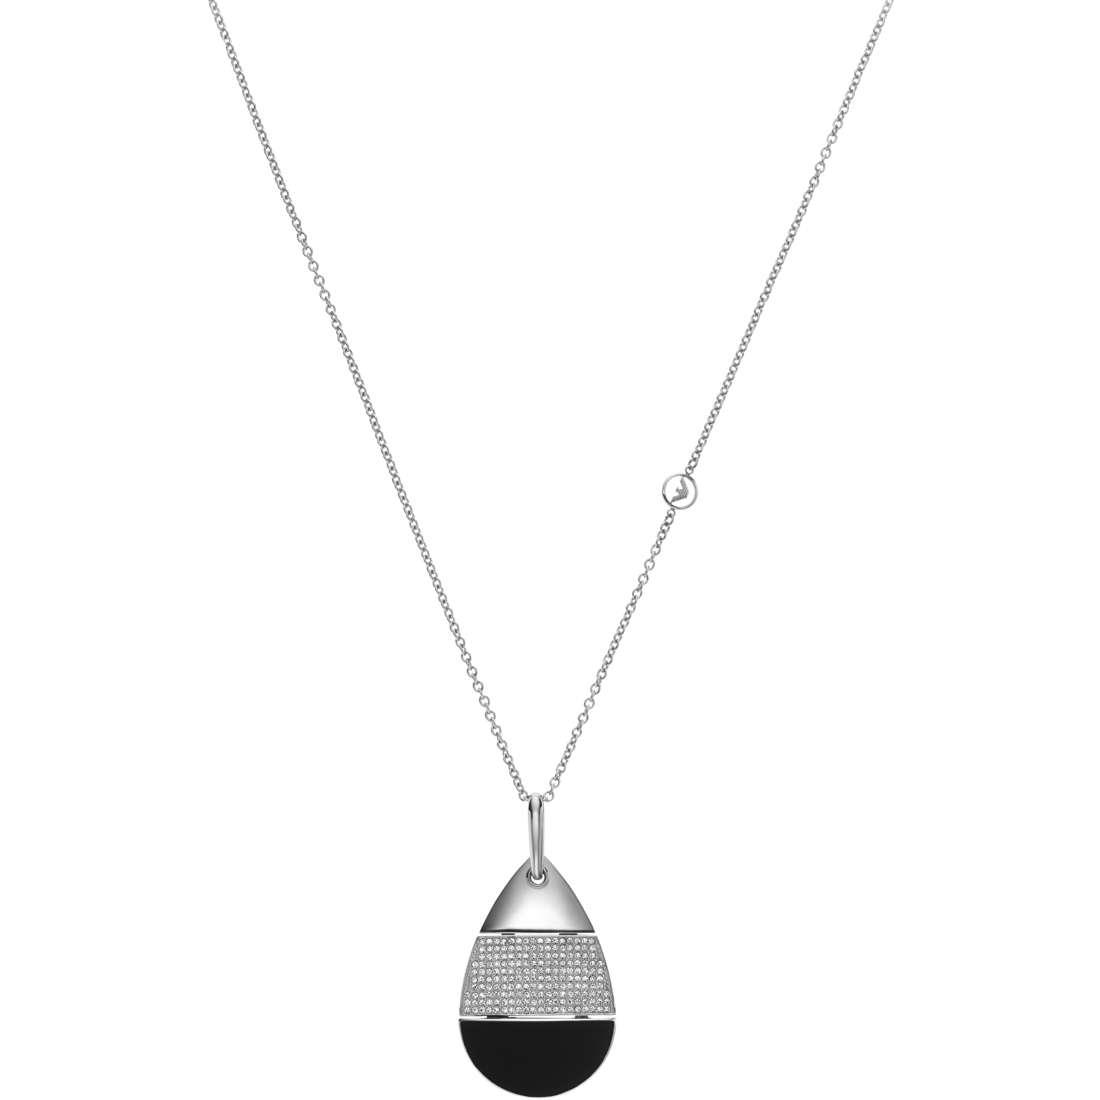 necklace woman jewellery Emporio Armani Fall 2013 EGS1771040